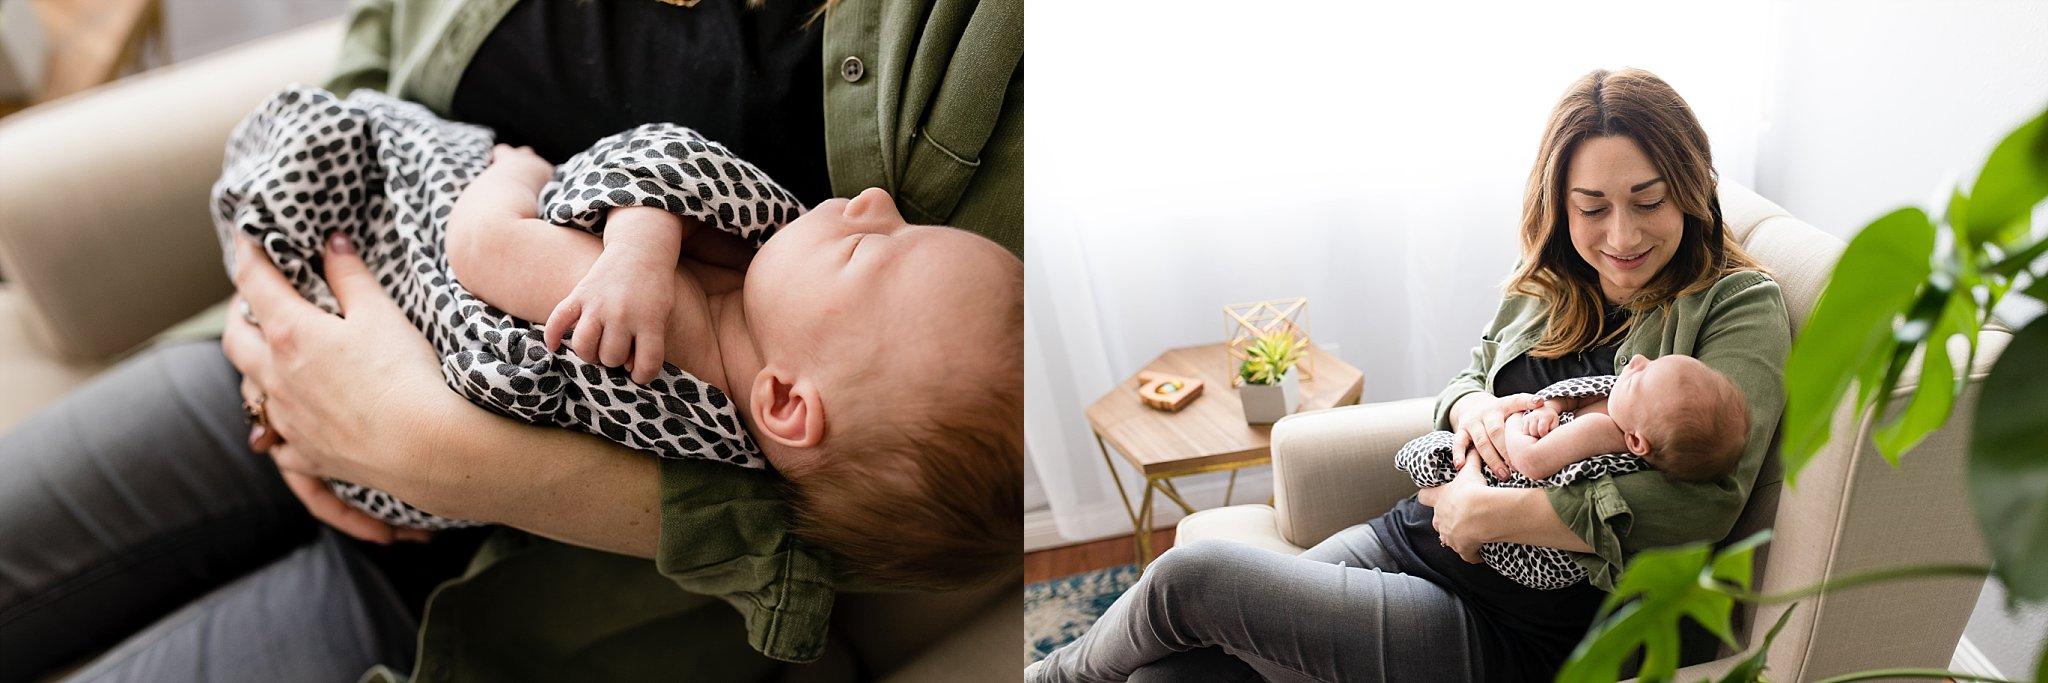 newborn-photographers-yukon-oklahoma-lifestyle-mom-holding-baby.jpg